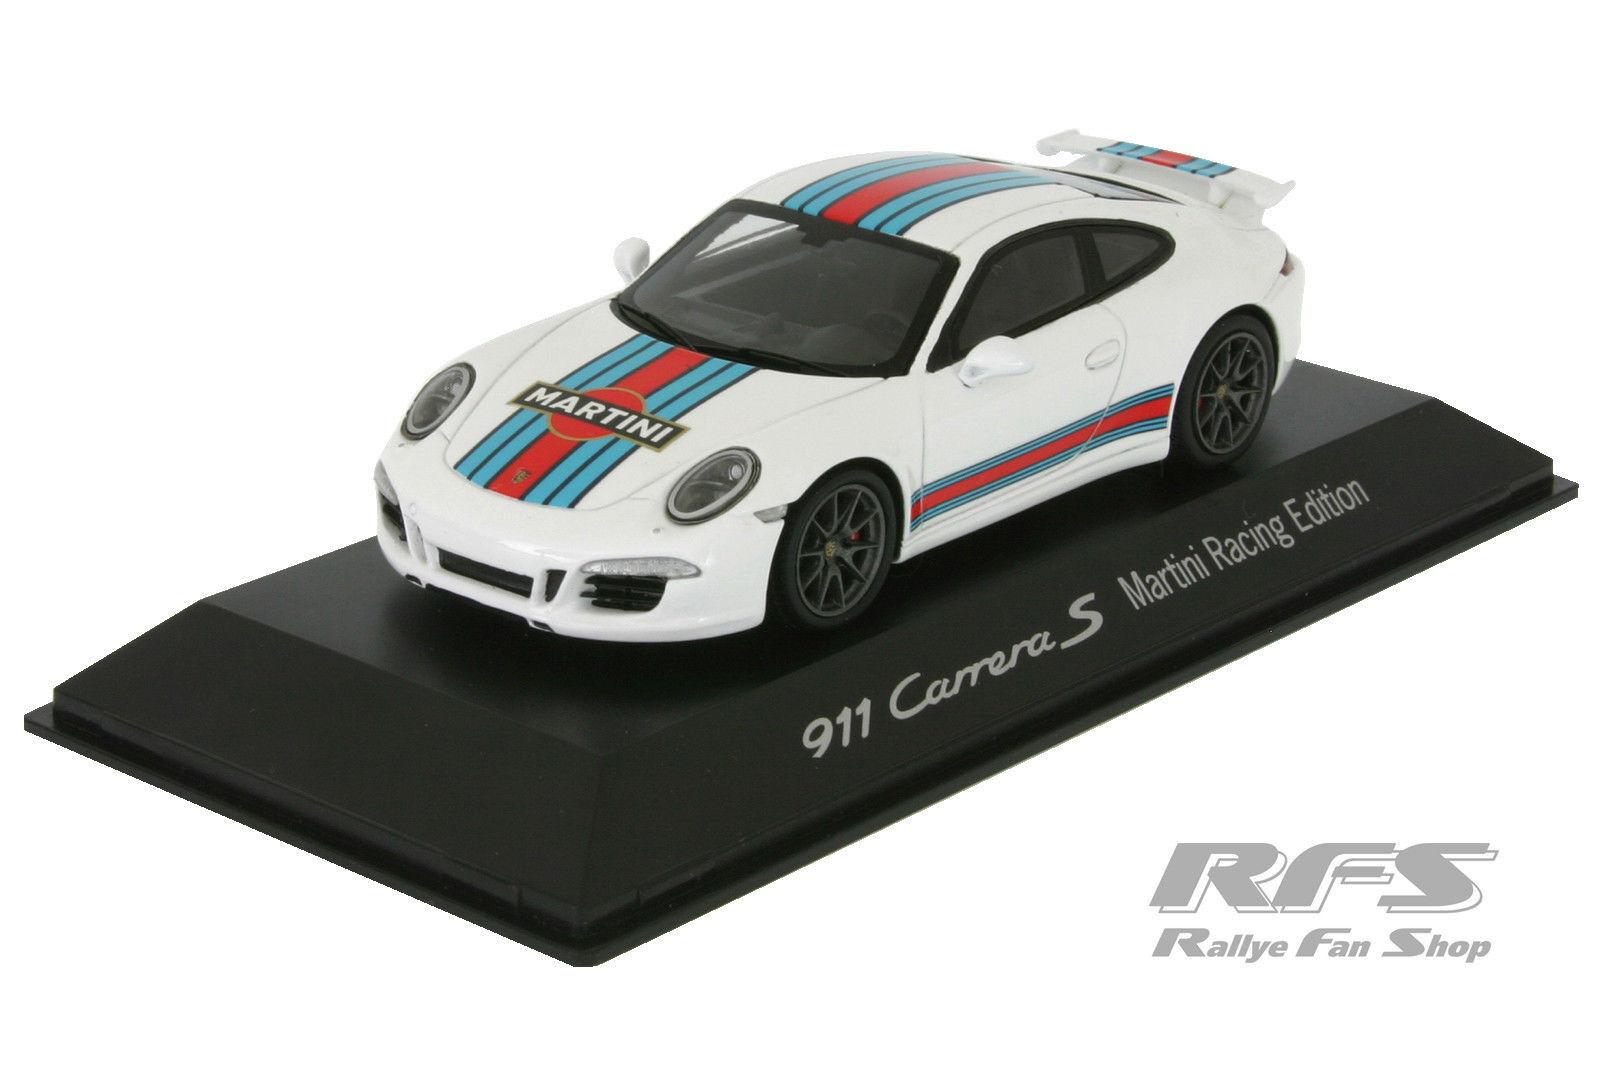 Porsche 911 911 911 991 Carrera s-Martini racing edition 2014 - 1 43 spark wap0202300g 2d557c